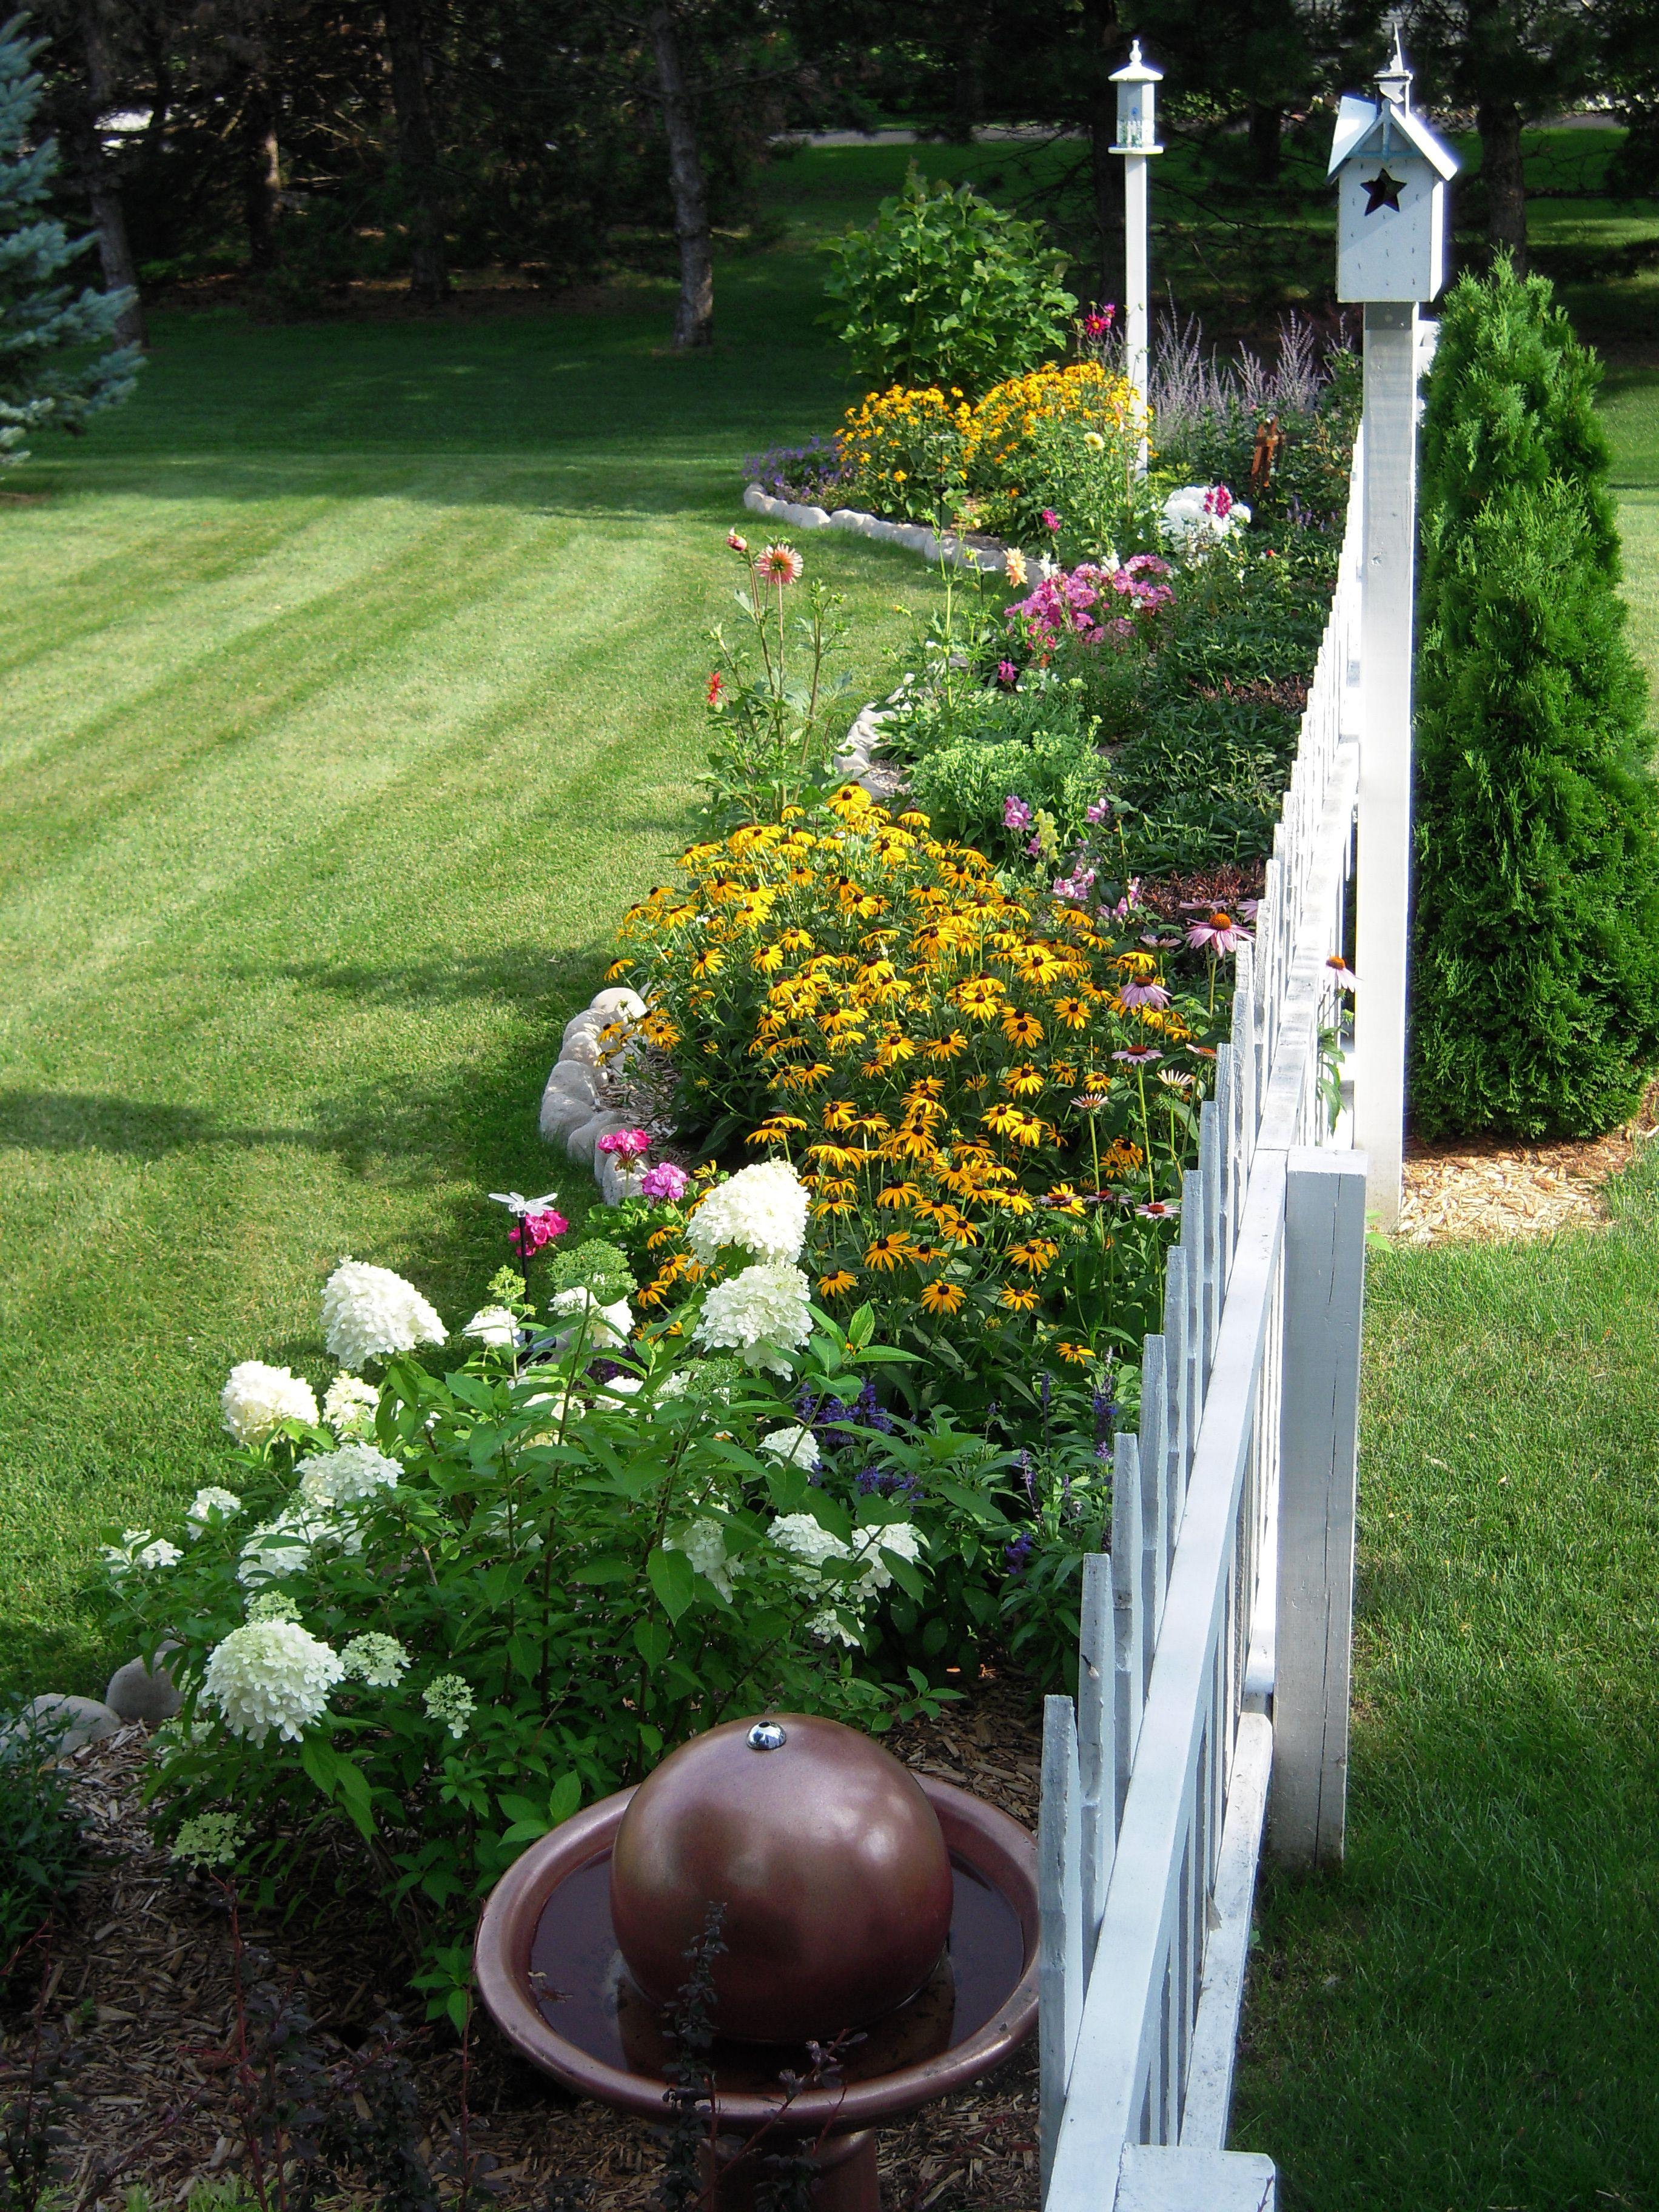 White picket fence flowers bird housesa few